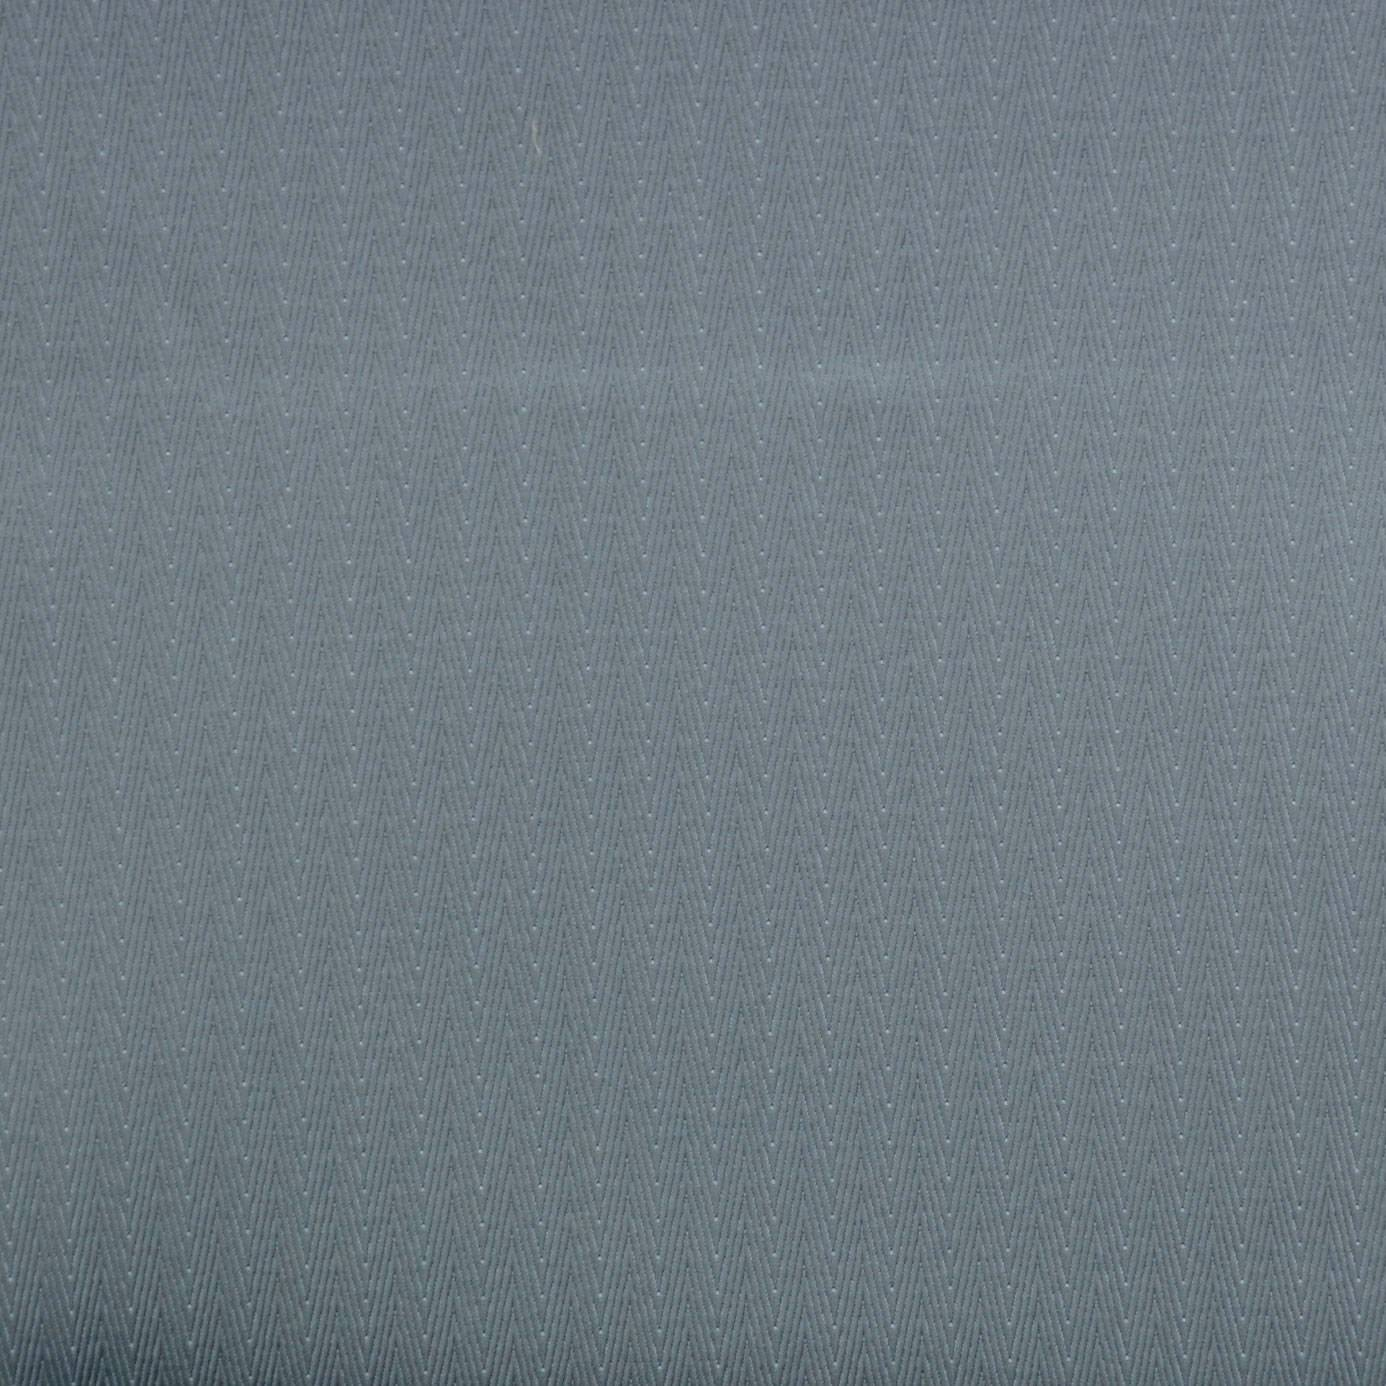 Lush Fabric Fjord 3146 595 Prestigious Textiles Mood